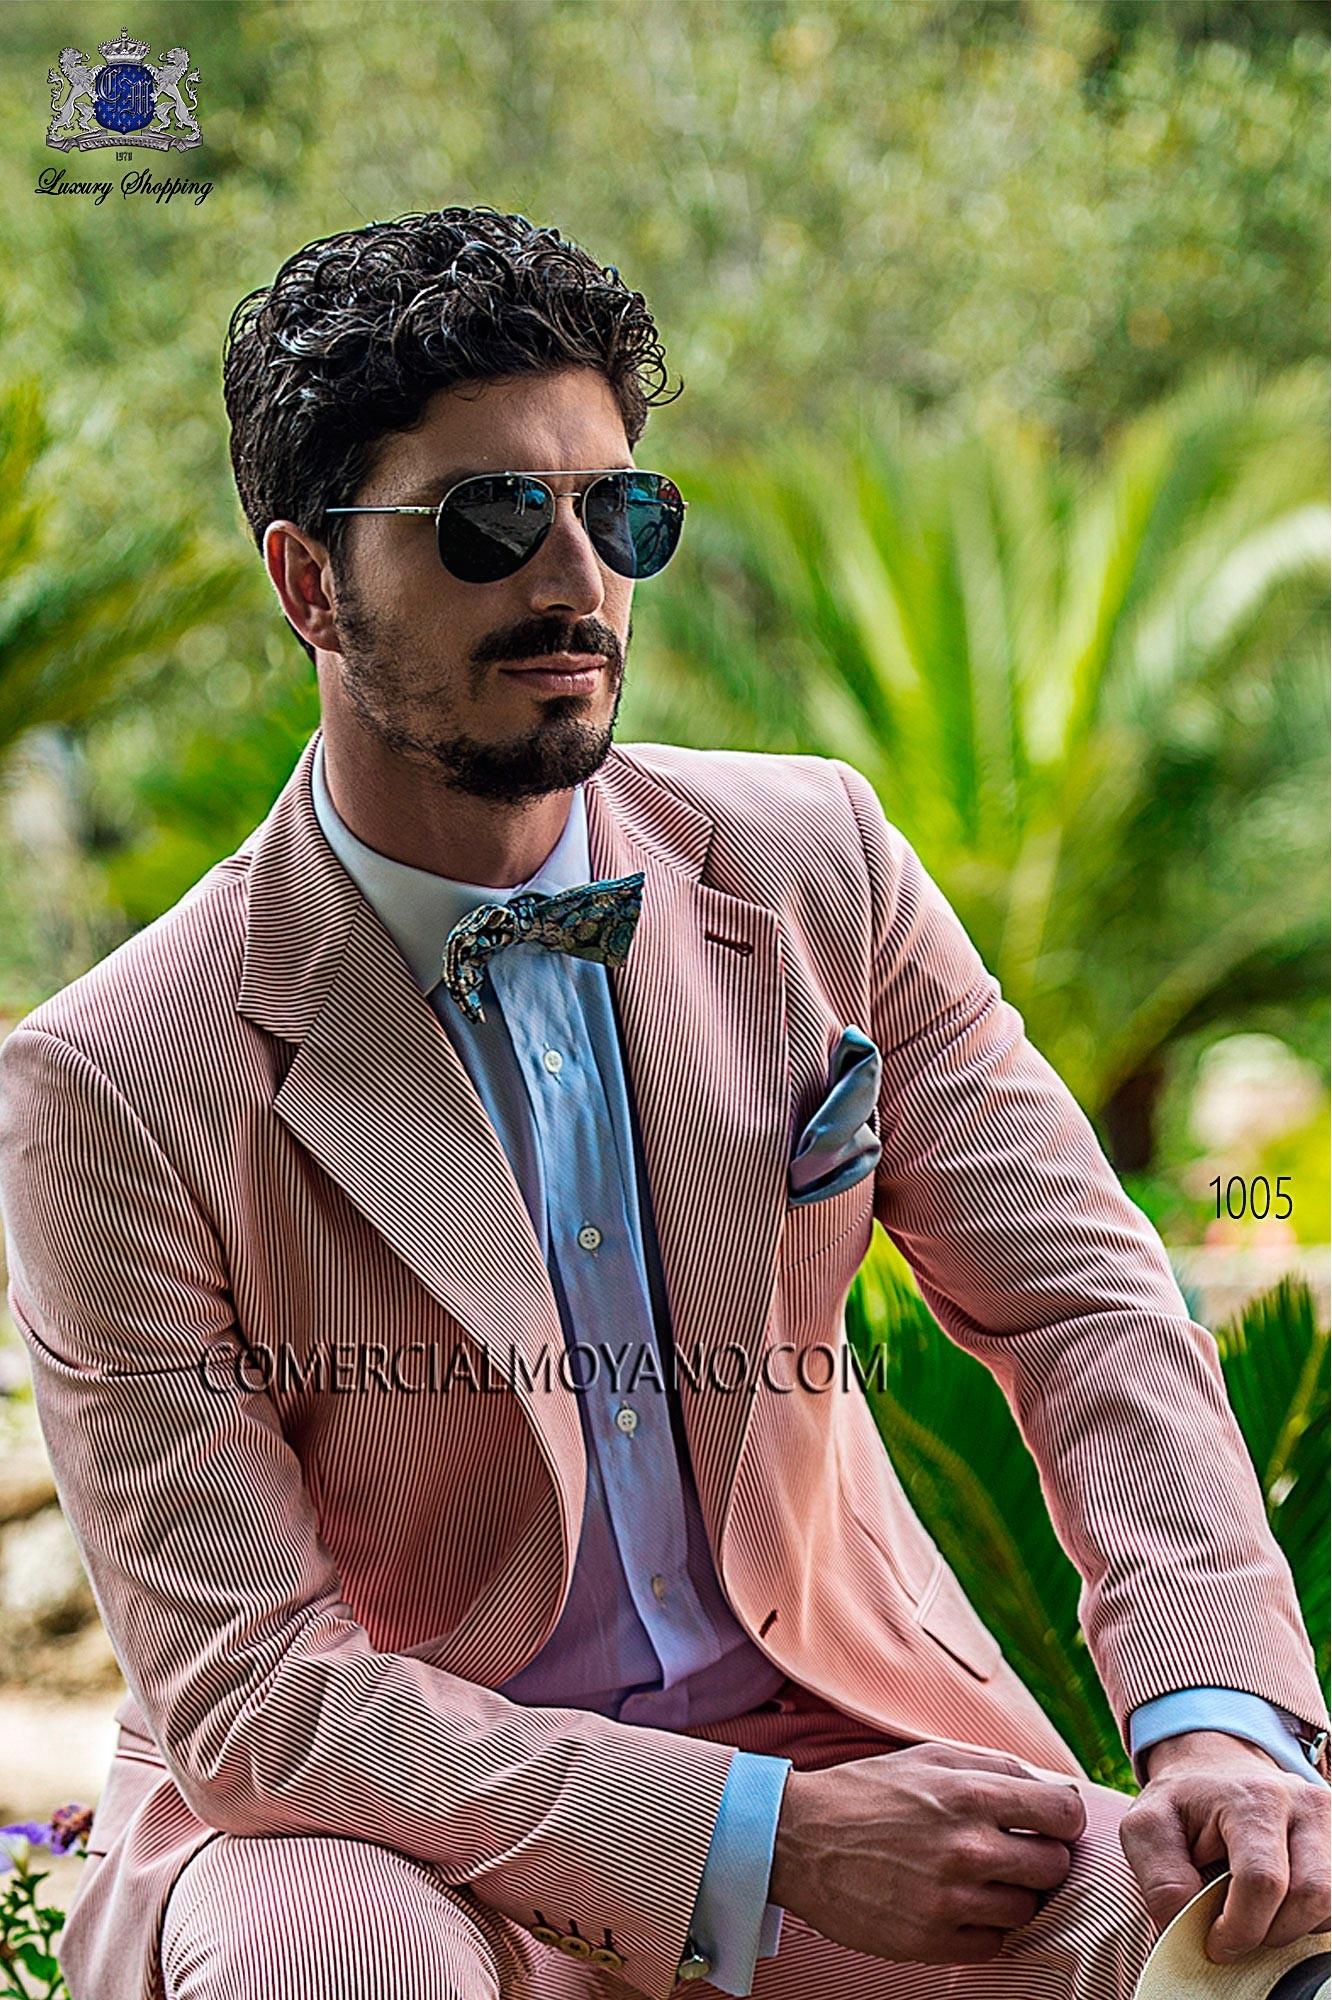 Traje Hipster de novio rojo modelo: 1005 Ottavio Nuccio Gala colección Hipster